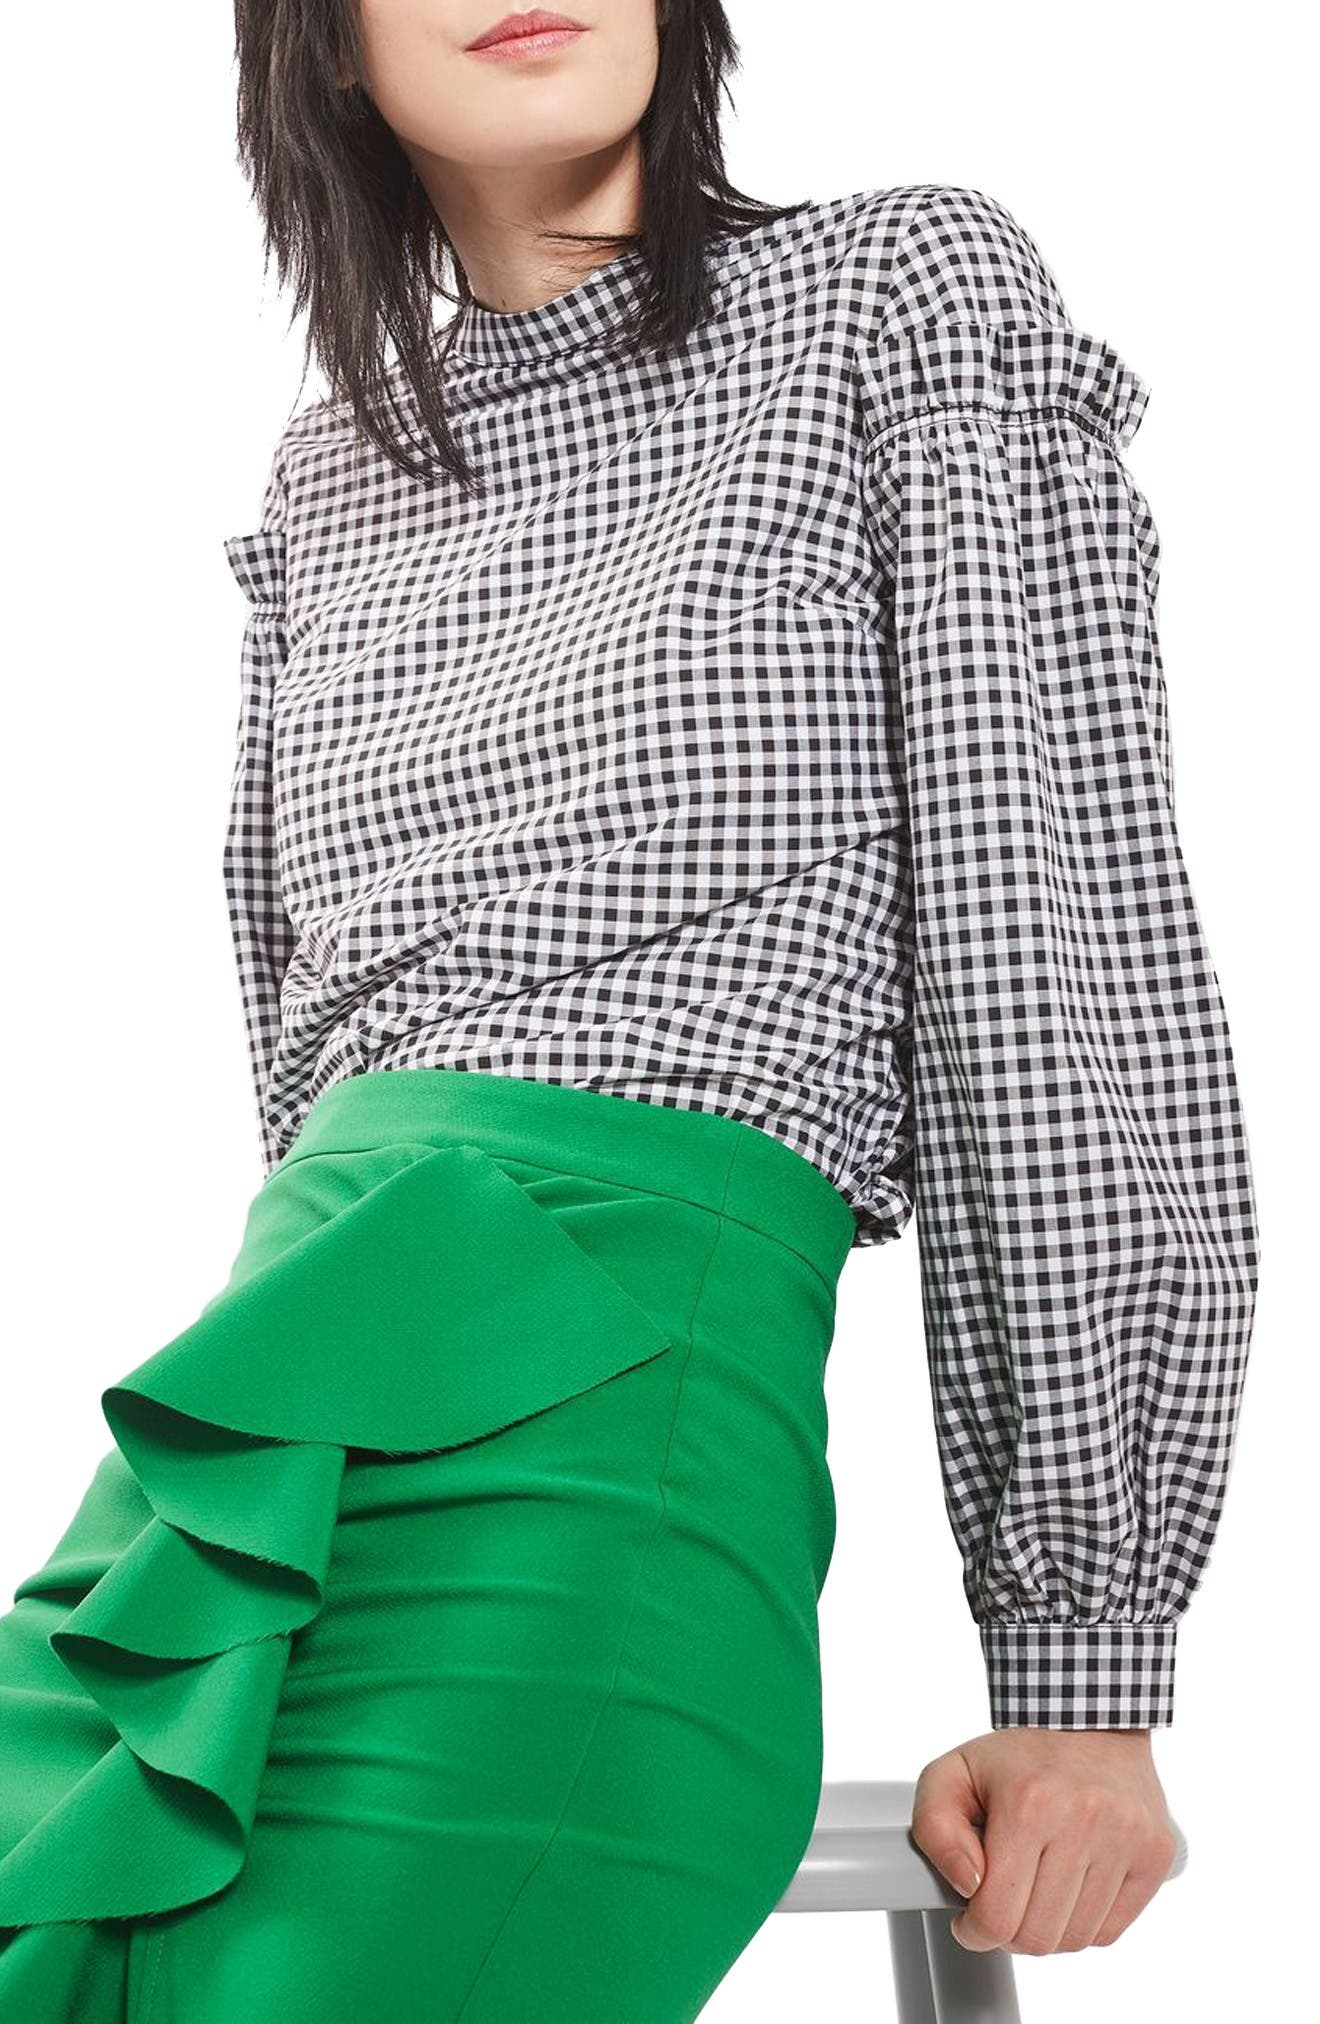 Main Image - Topshop Gingham Mutton Sleeve Top (Regular & Petite)